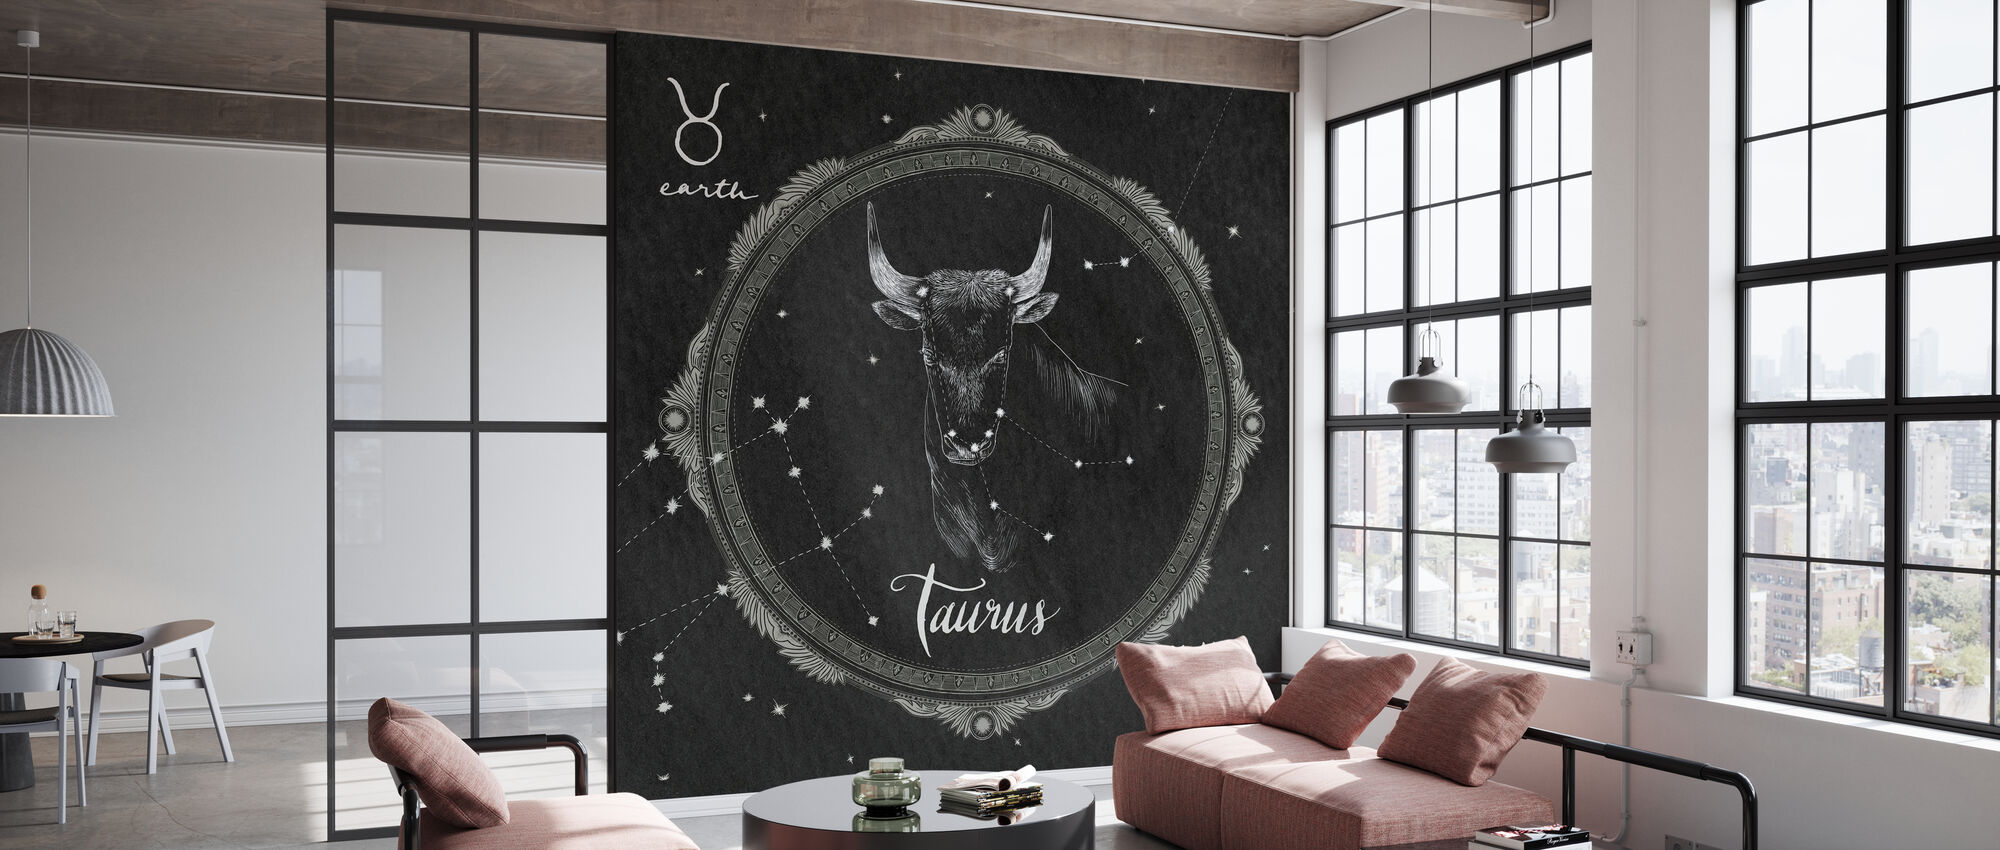 Night Sky Taurus - Wallpaper - Office